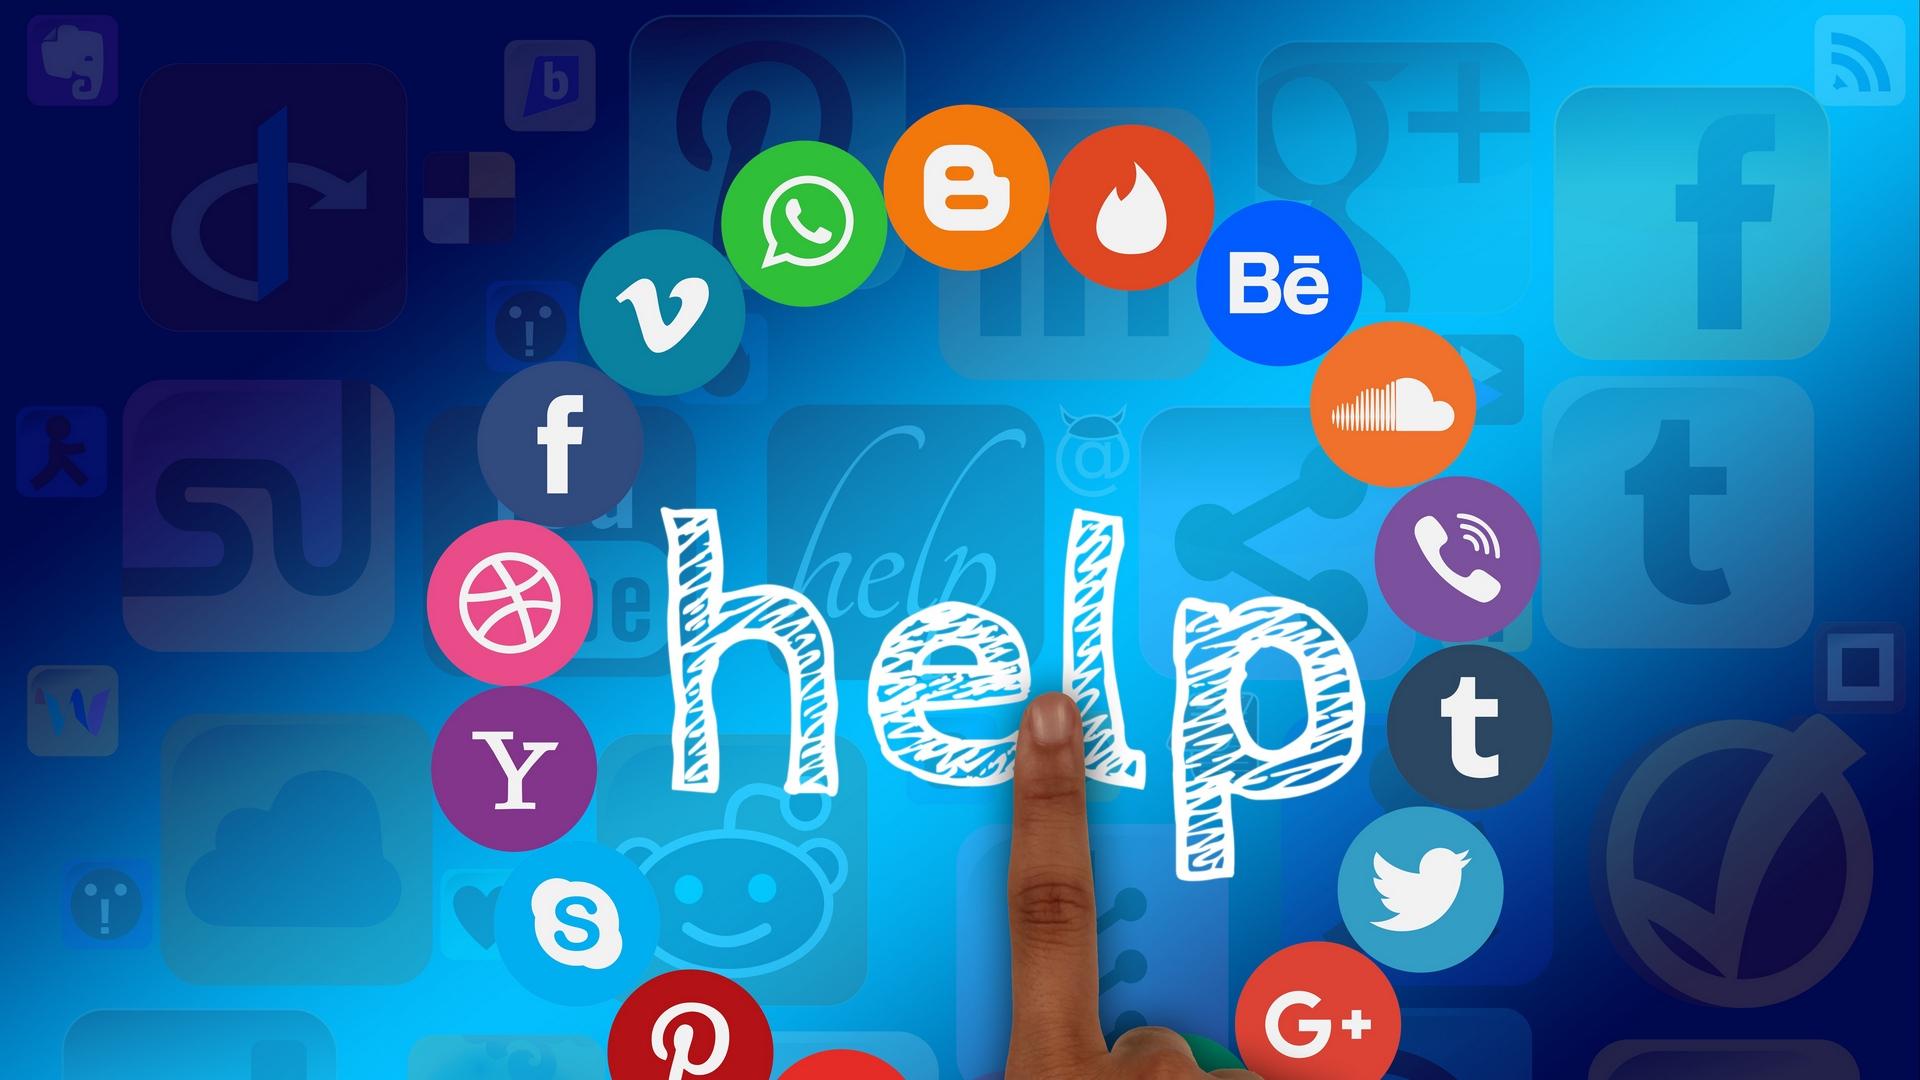 Download wallpaper 1920x1080 social networks youtube google 1920x1080